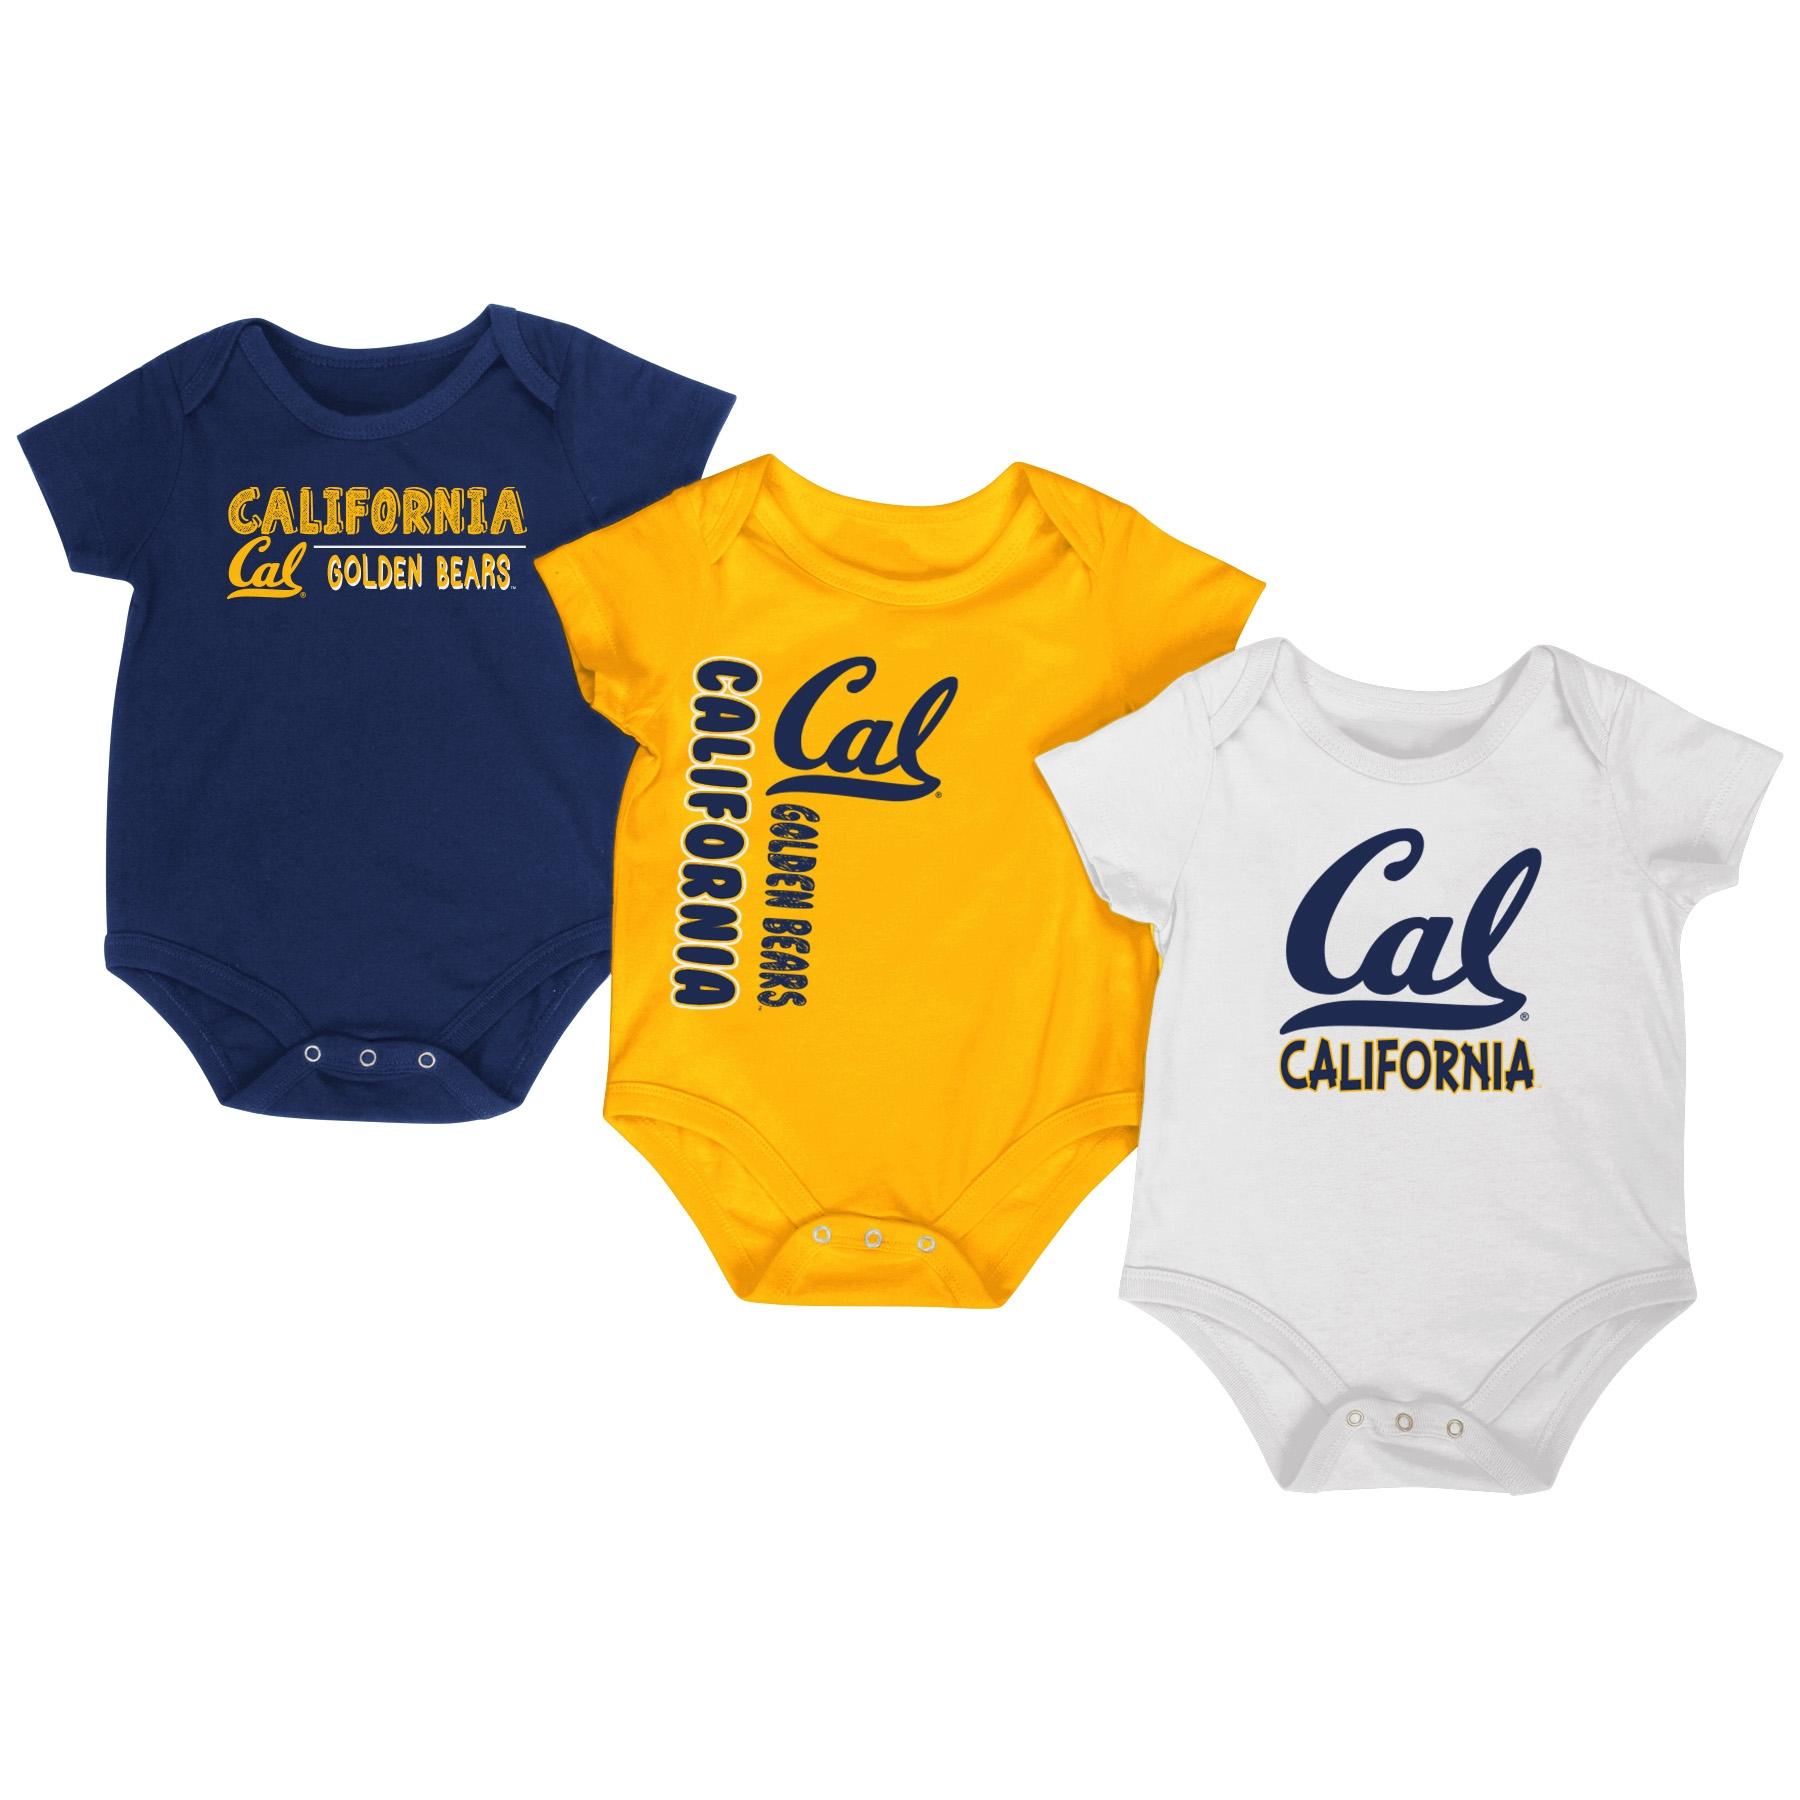 University of California Berkeley Infant Trifecta Onesie 3-Pack